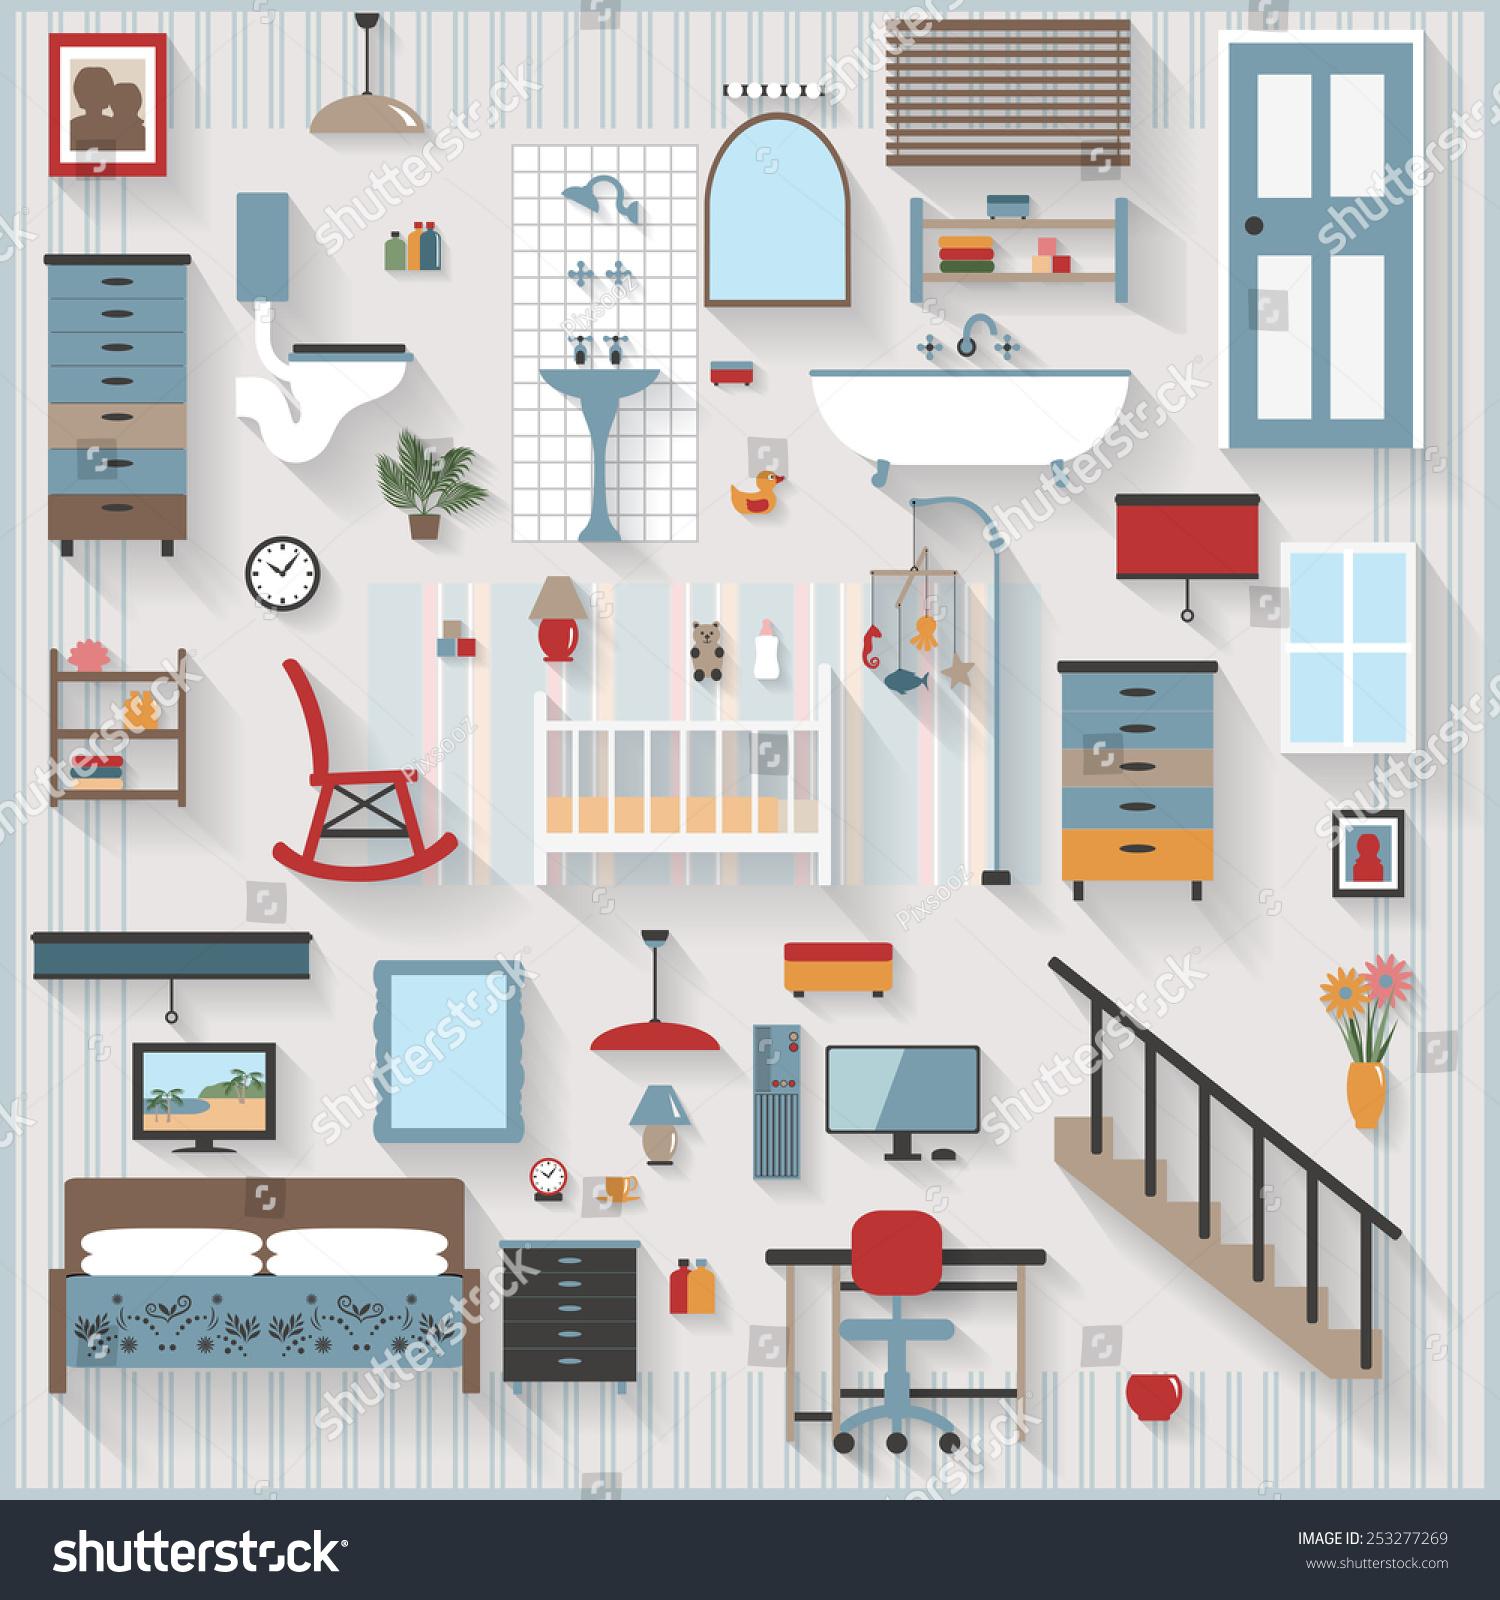 Furniture Long Shadows Icons Nursery Baby Stock Vector ...